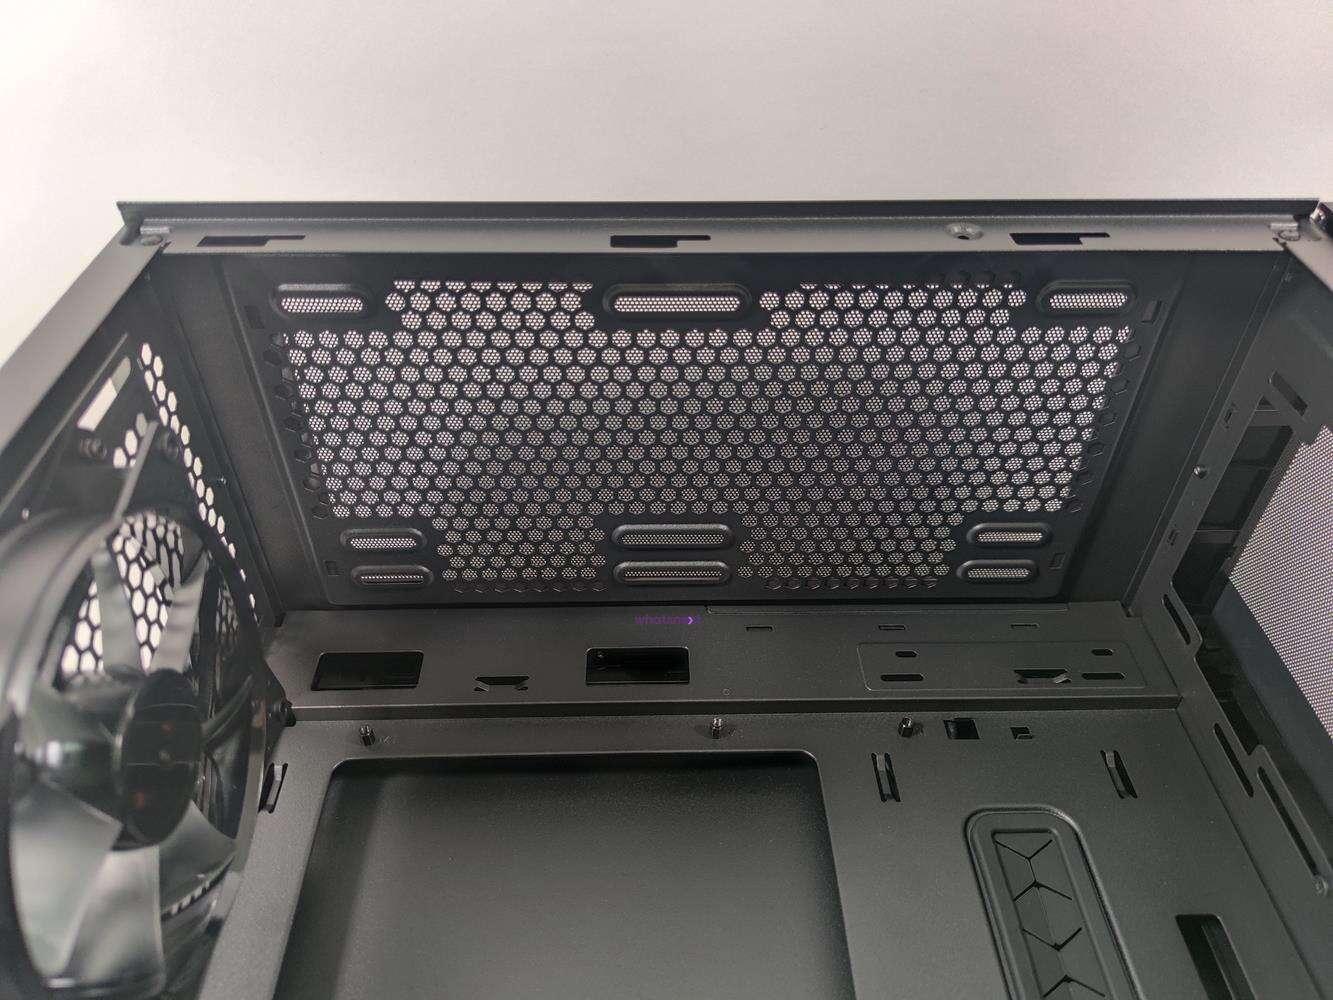 test Cooler Master MasterBox NR400, recenzja Cooler Master MasterBox NR400, opinia Cooler Master MasterBox NR400